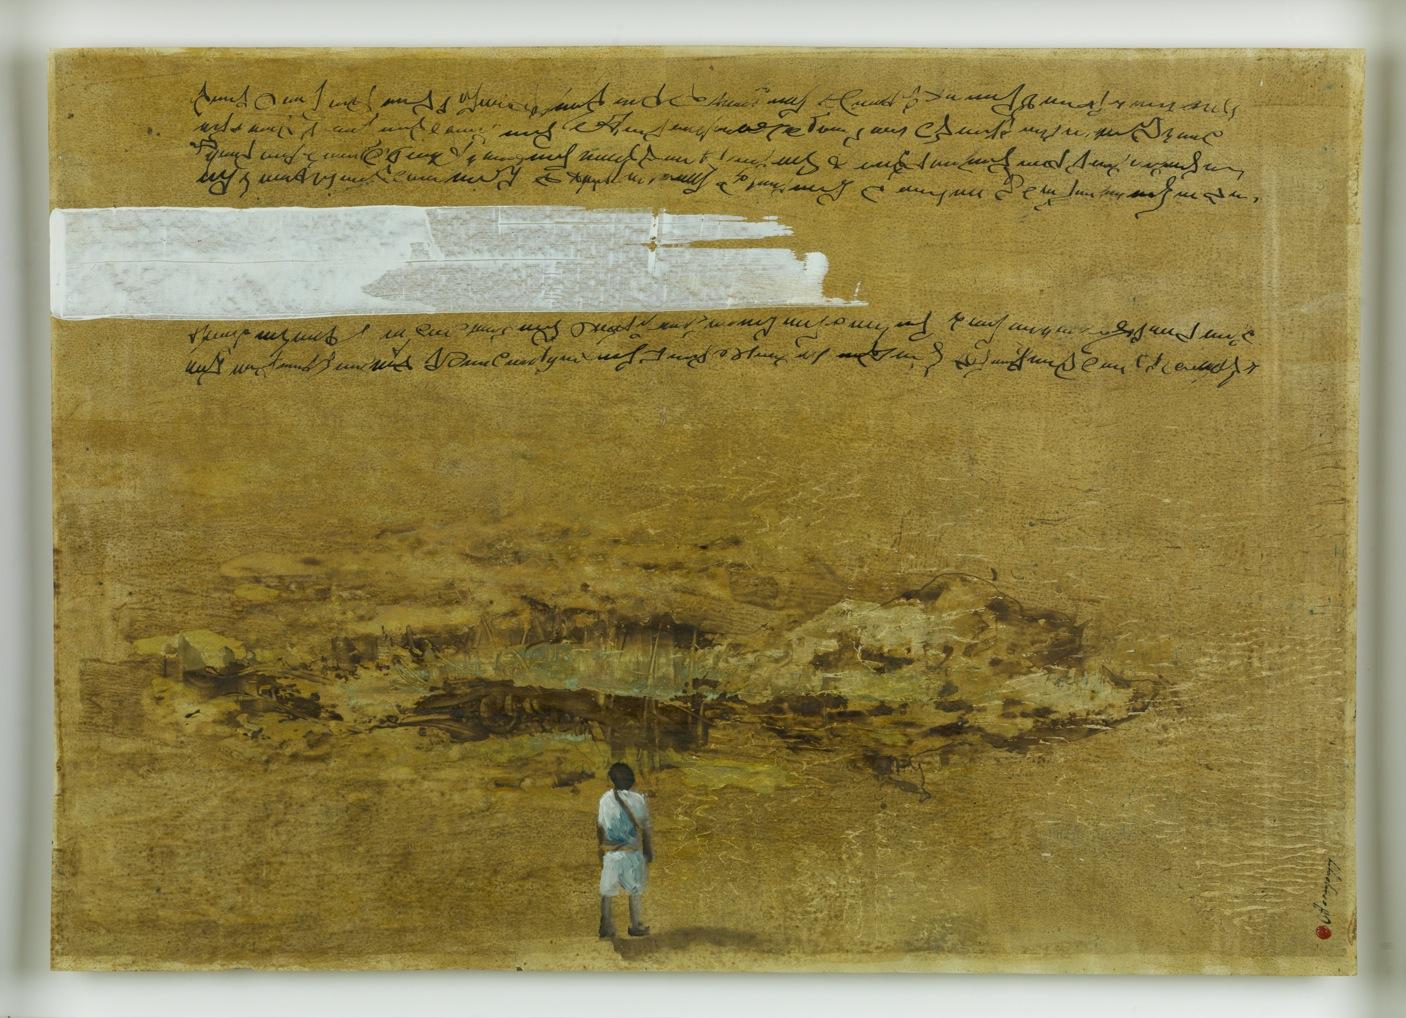 ARCHES 522 / 68 x 96 cm